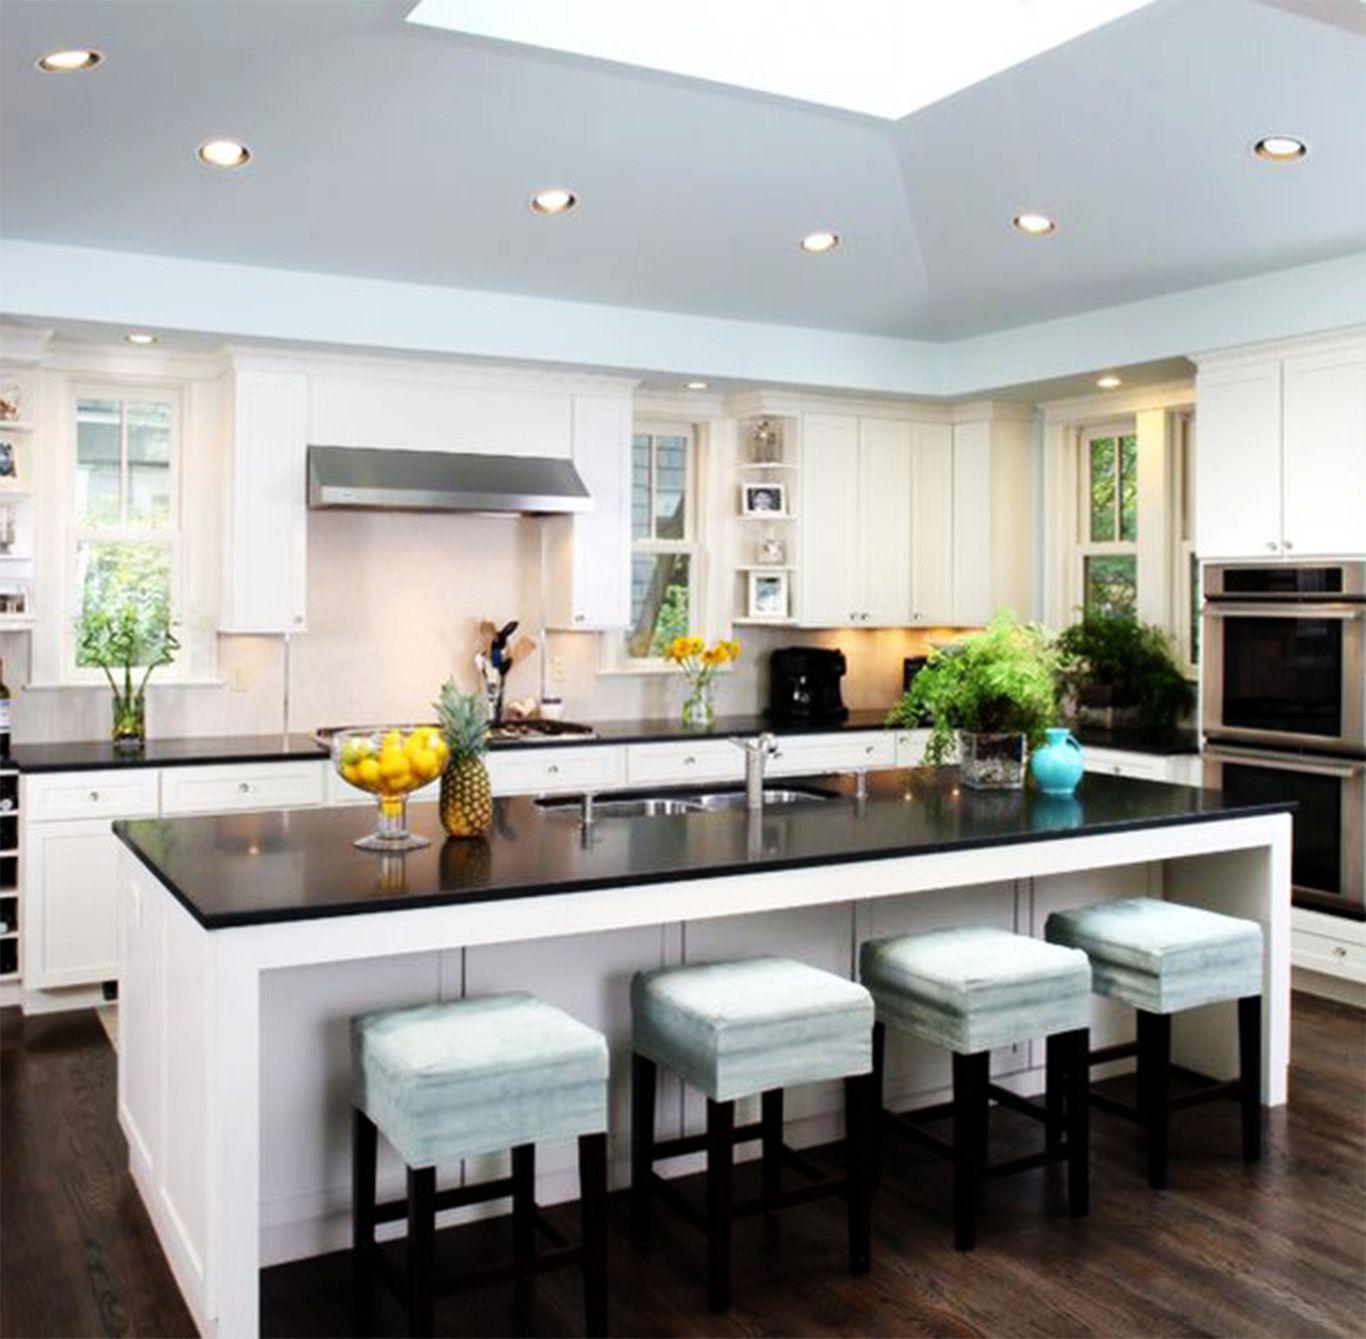 Modern Kitchen Island Designs With Seating: Modern Kitchen Island Design:marvellous Kitchen